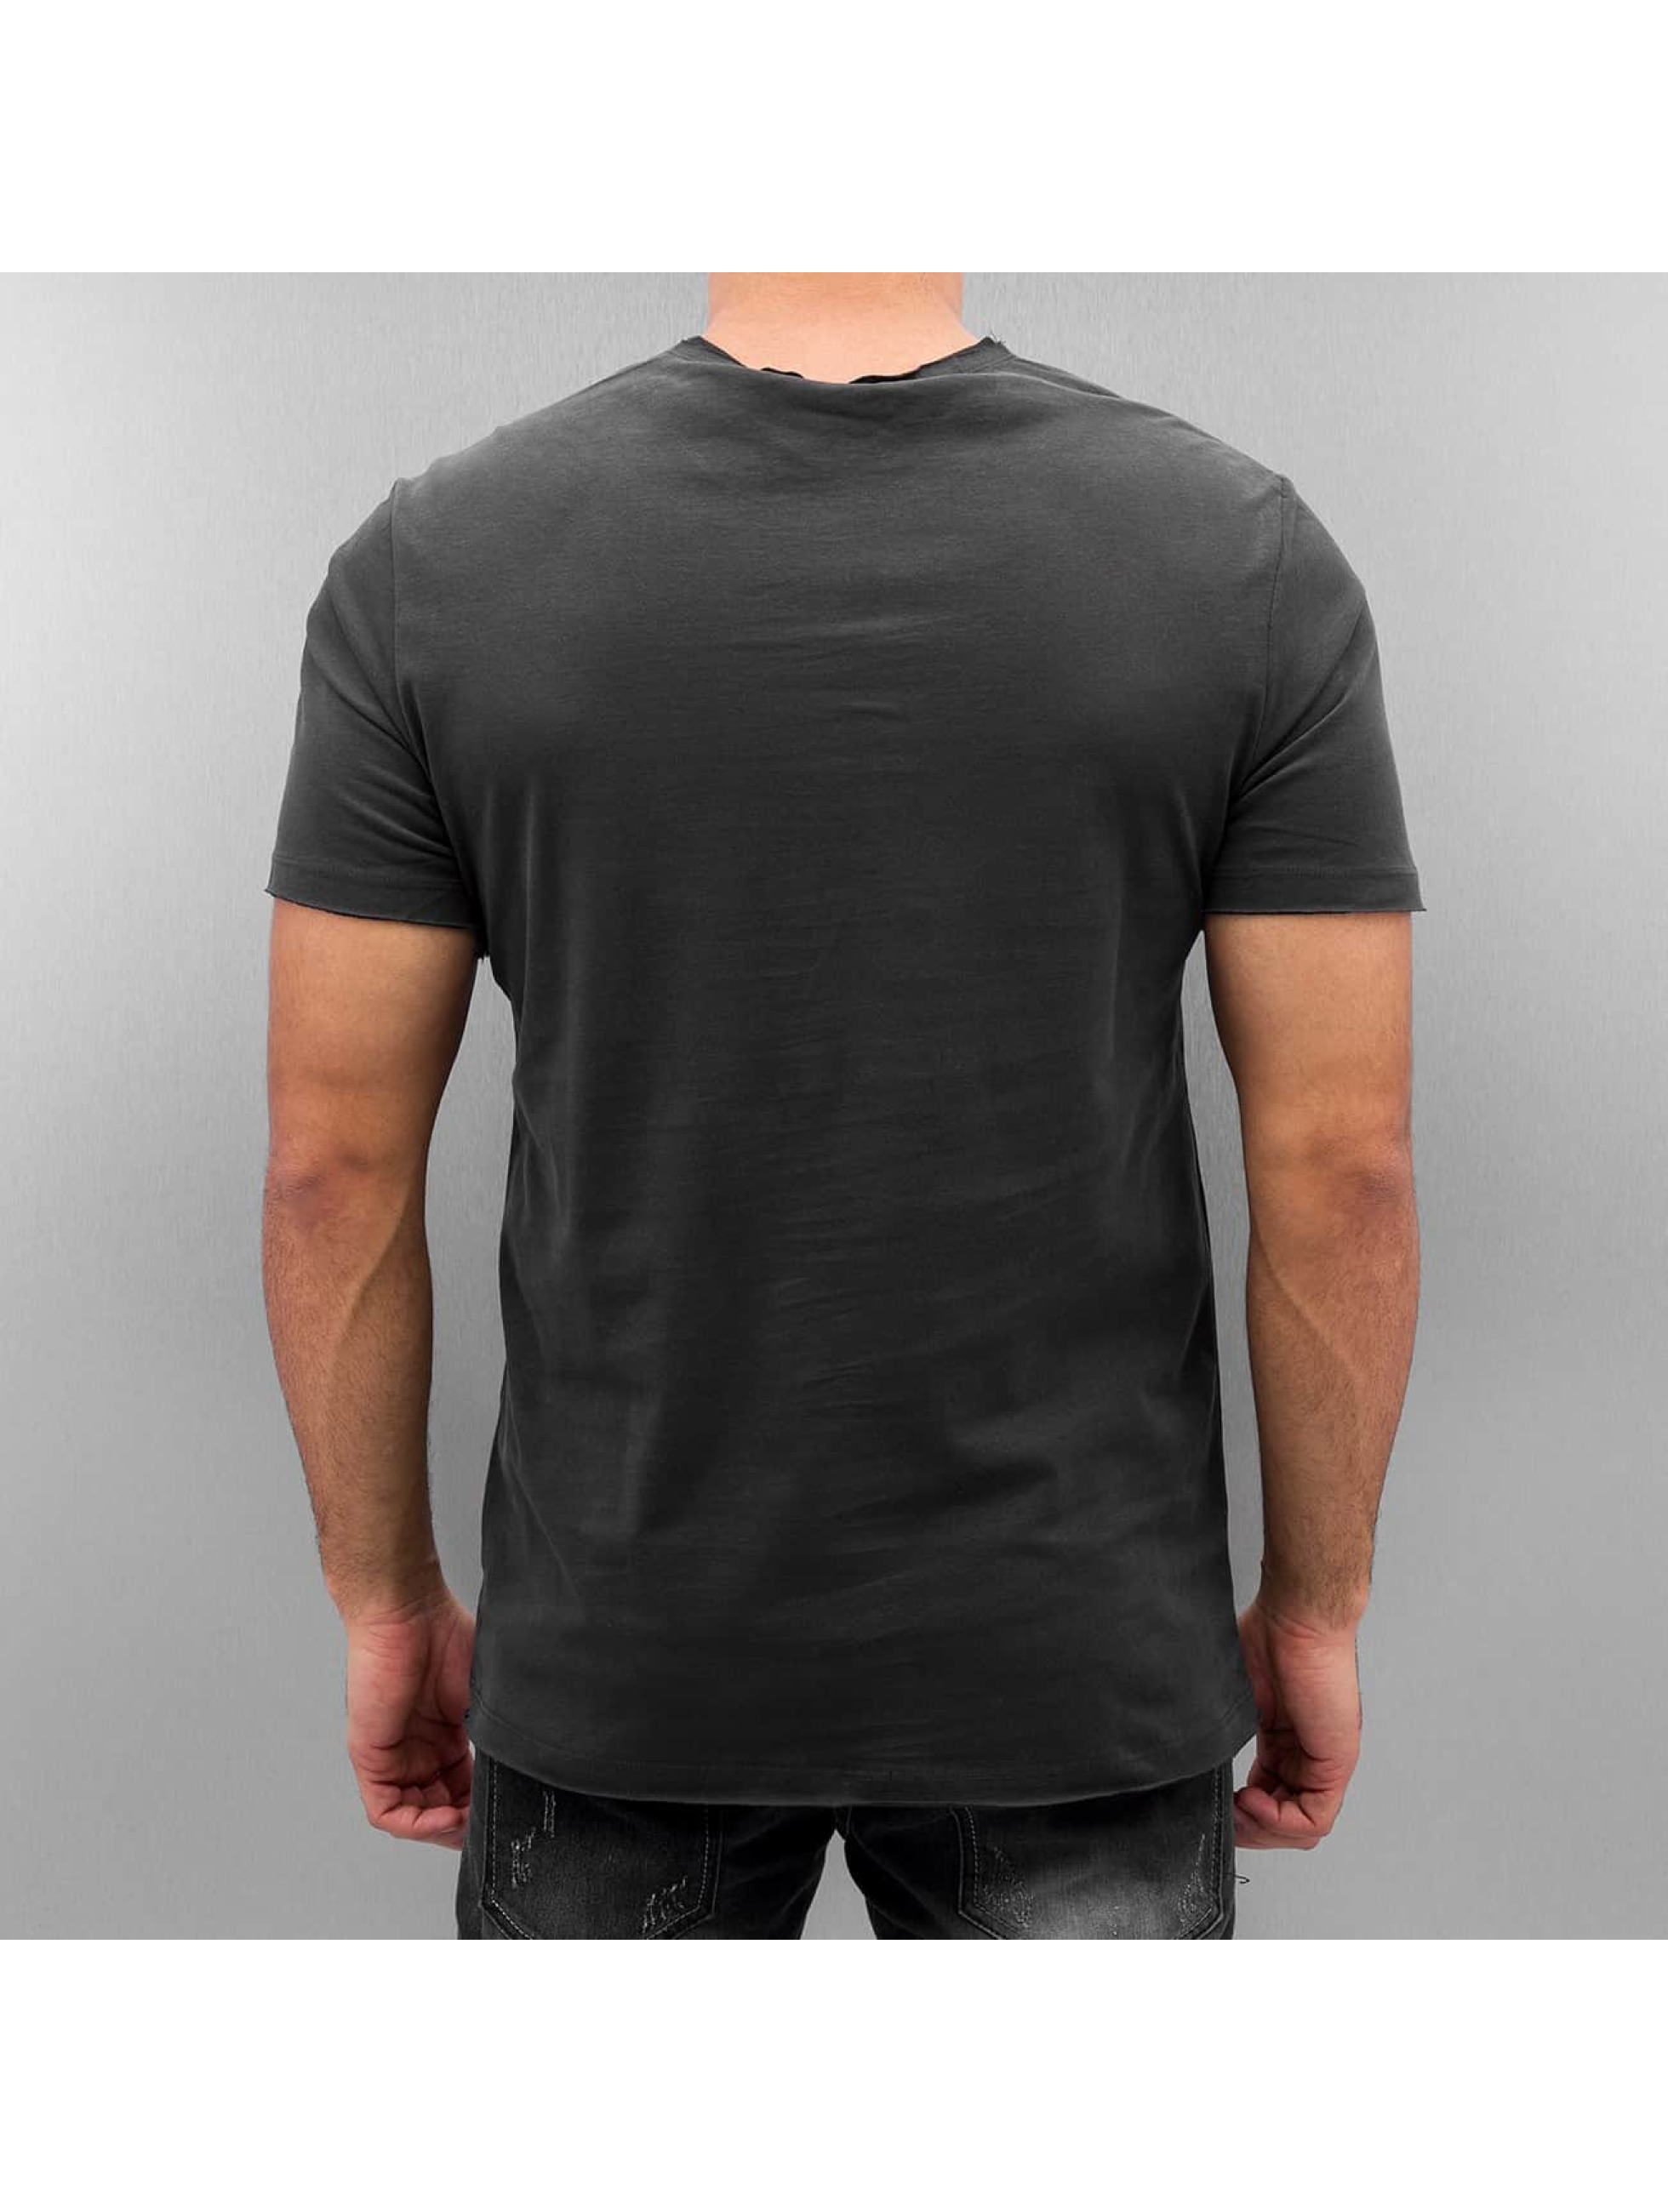 Amplified T-shirt RUN DMC Logo grå